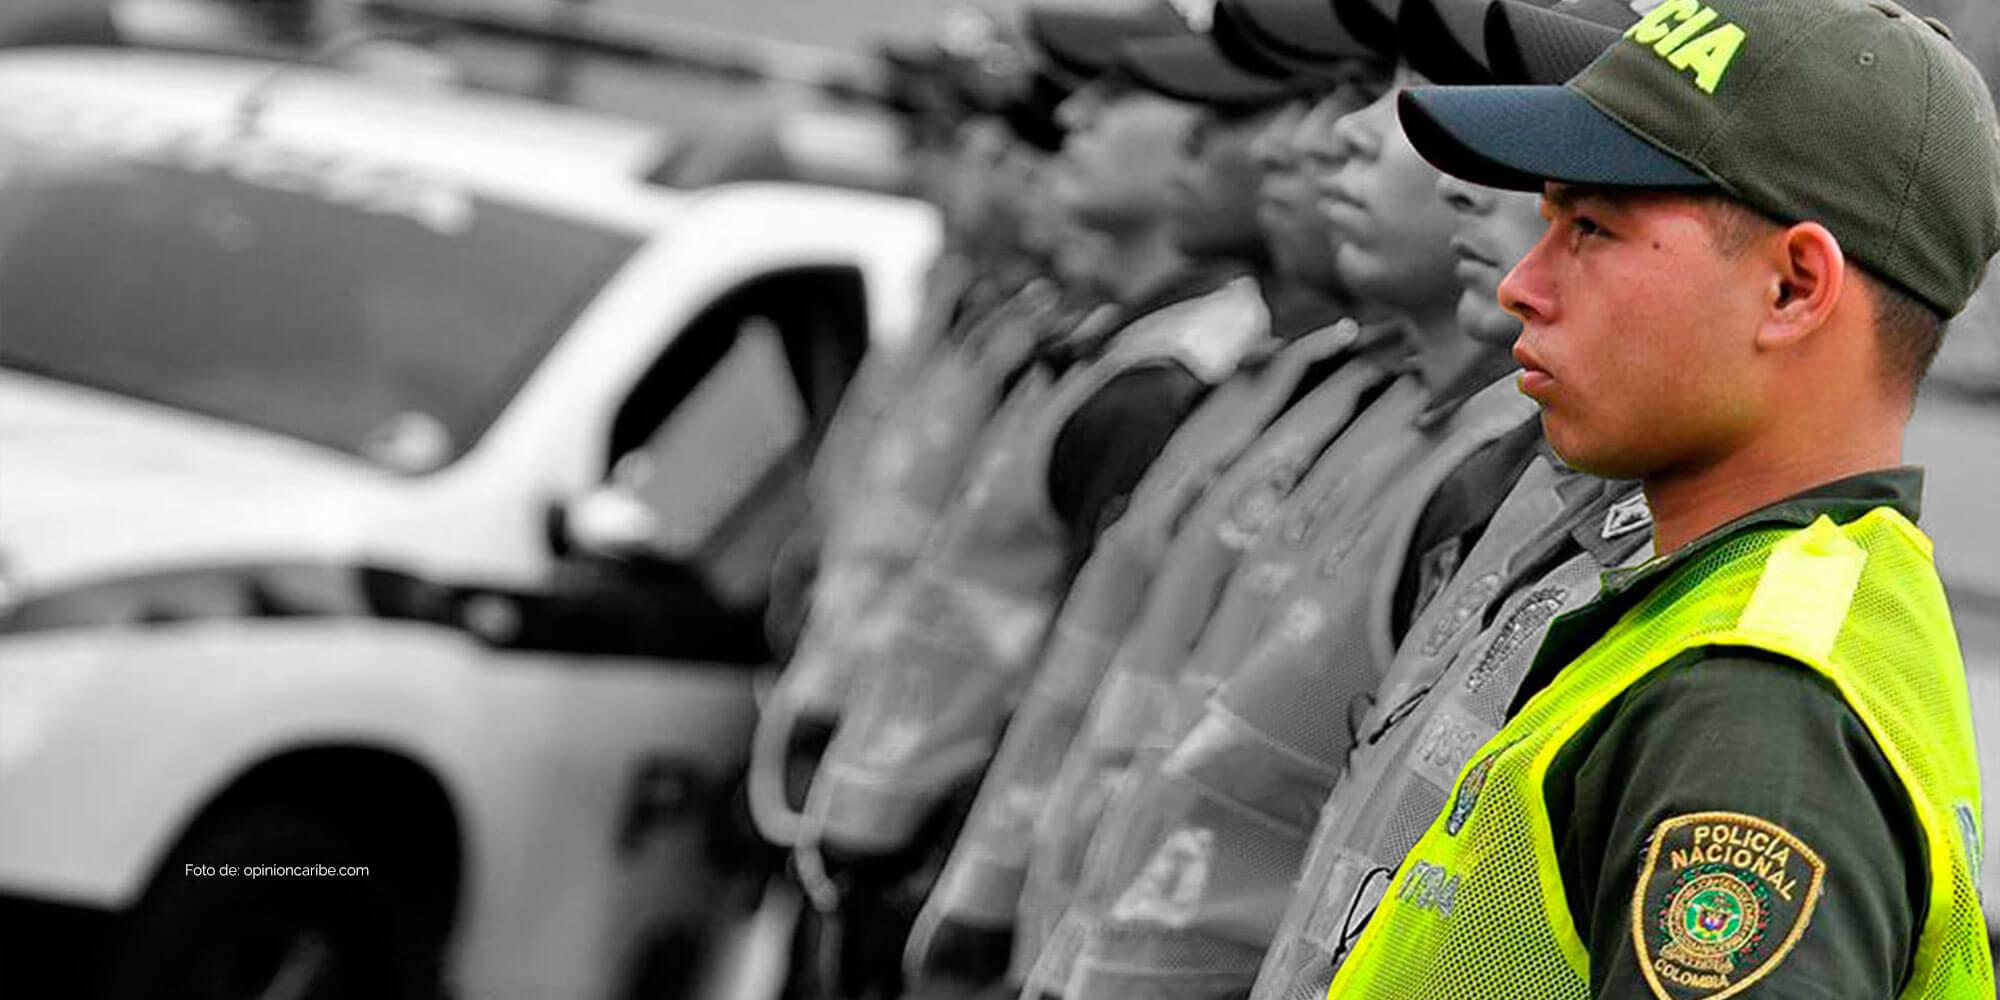 Equipos de defensa para Policia Nacional